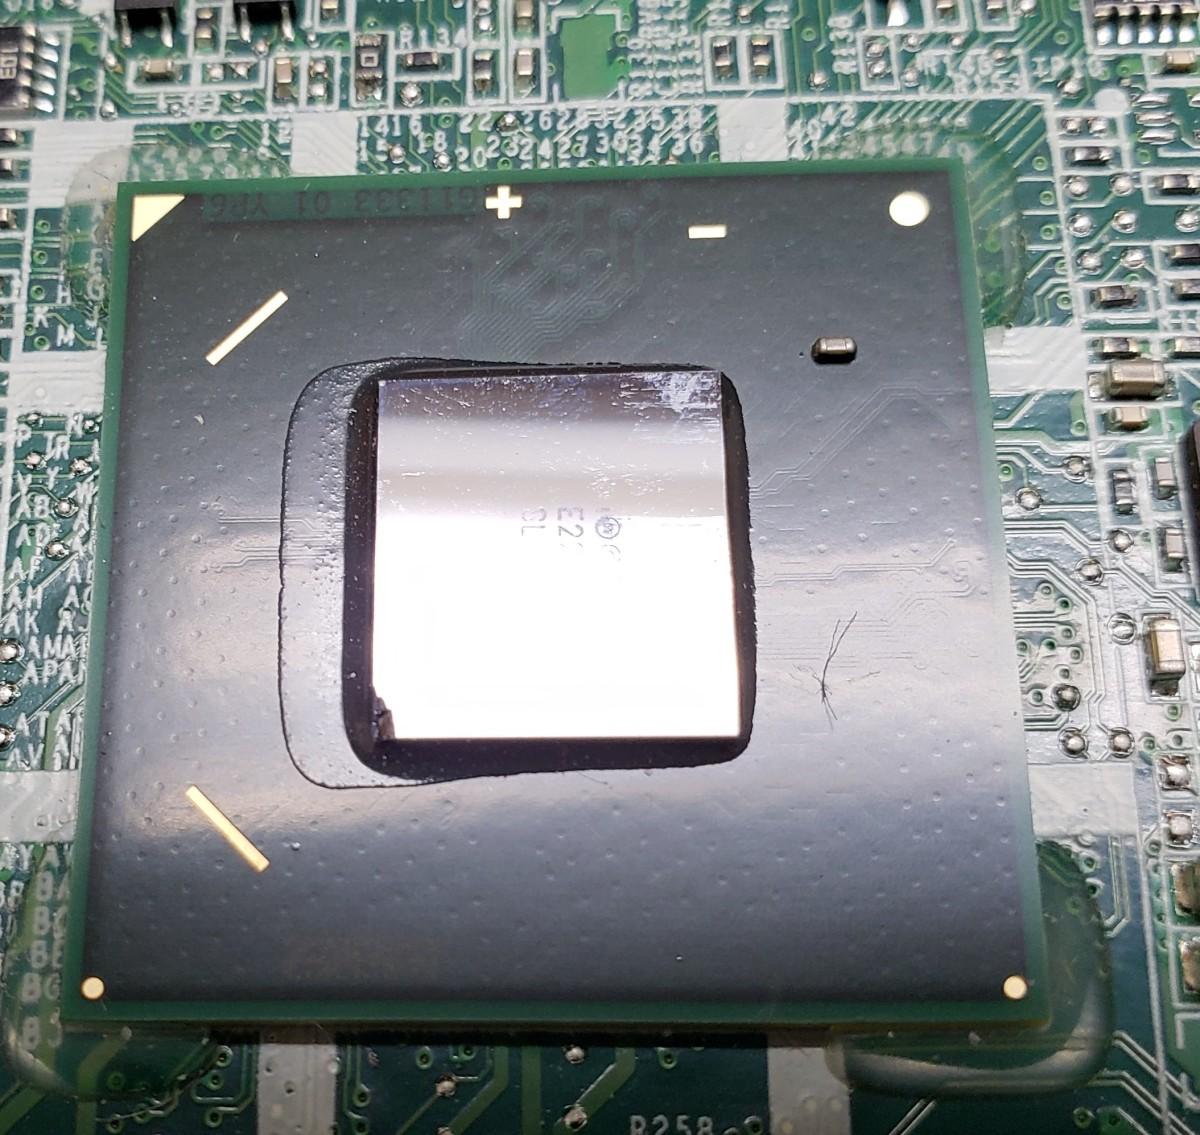 Chipped GPU, Lower Left Corner